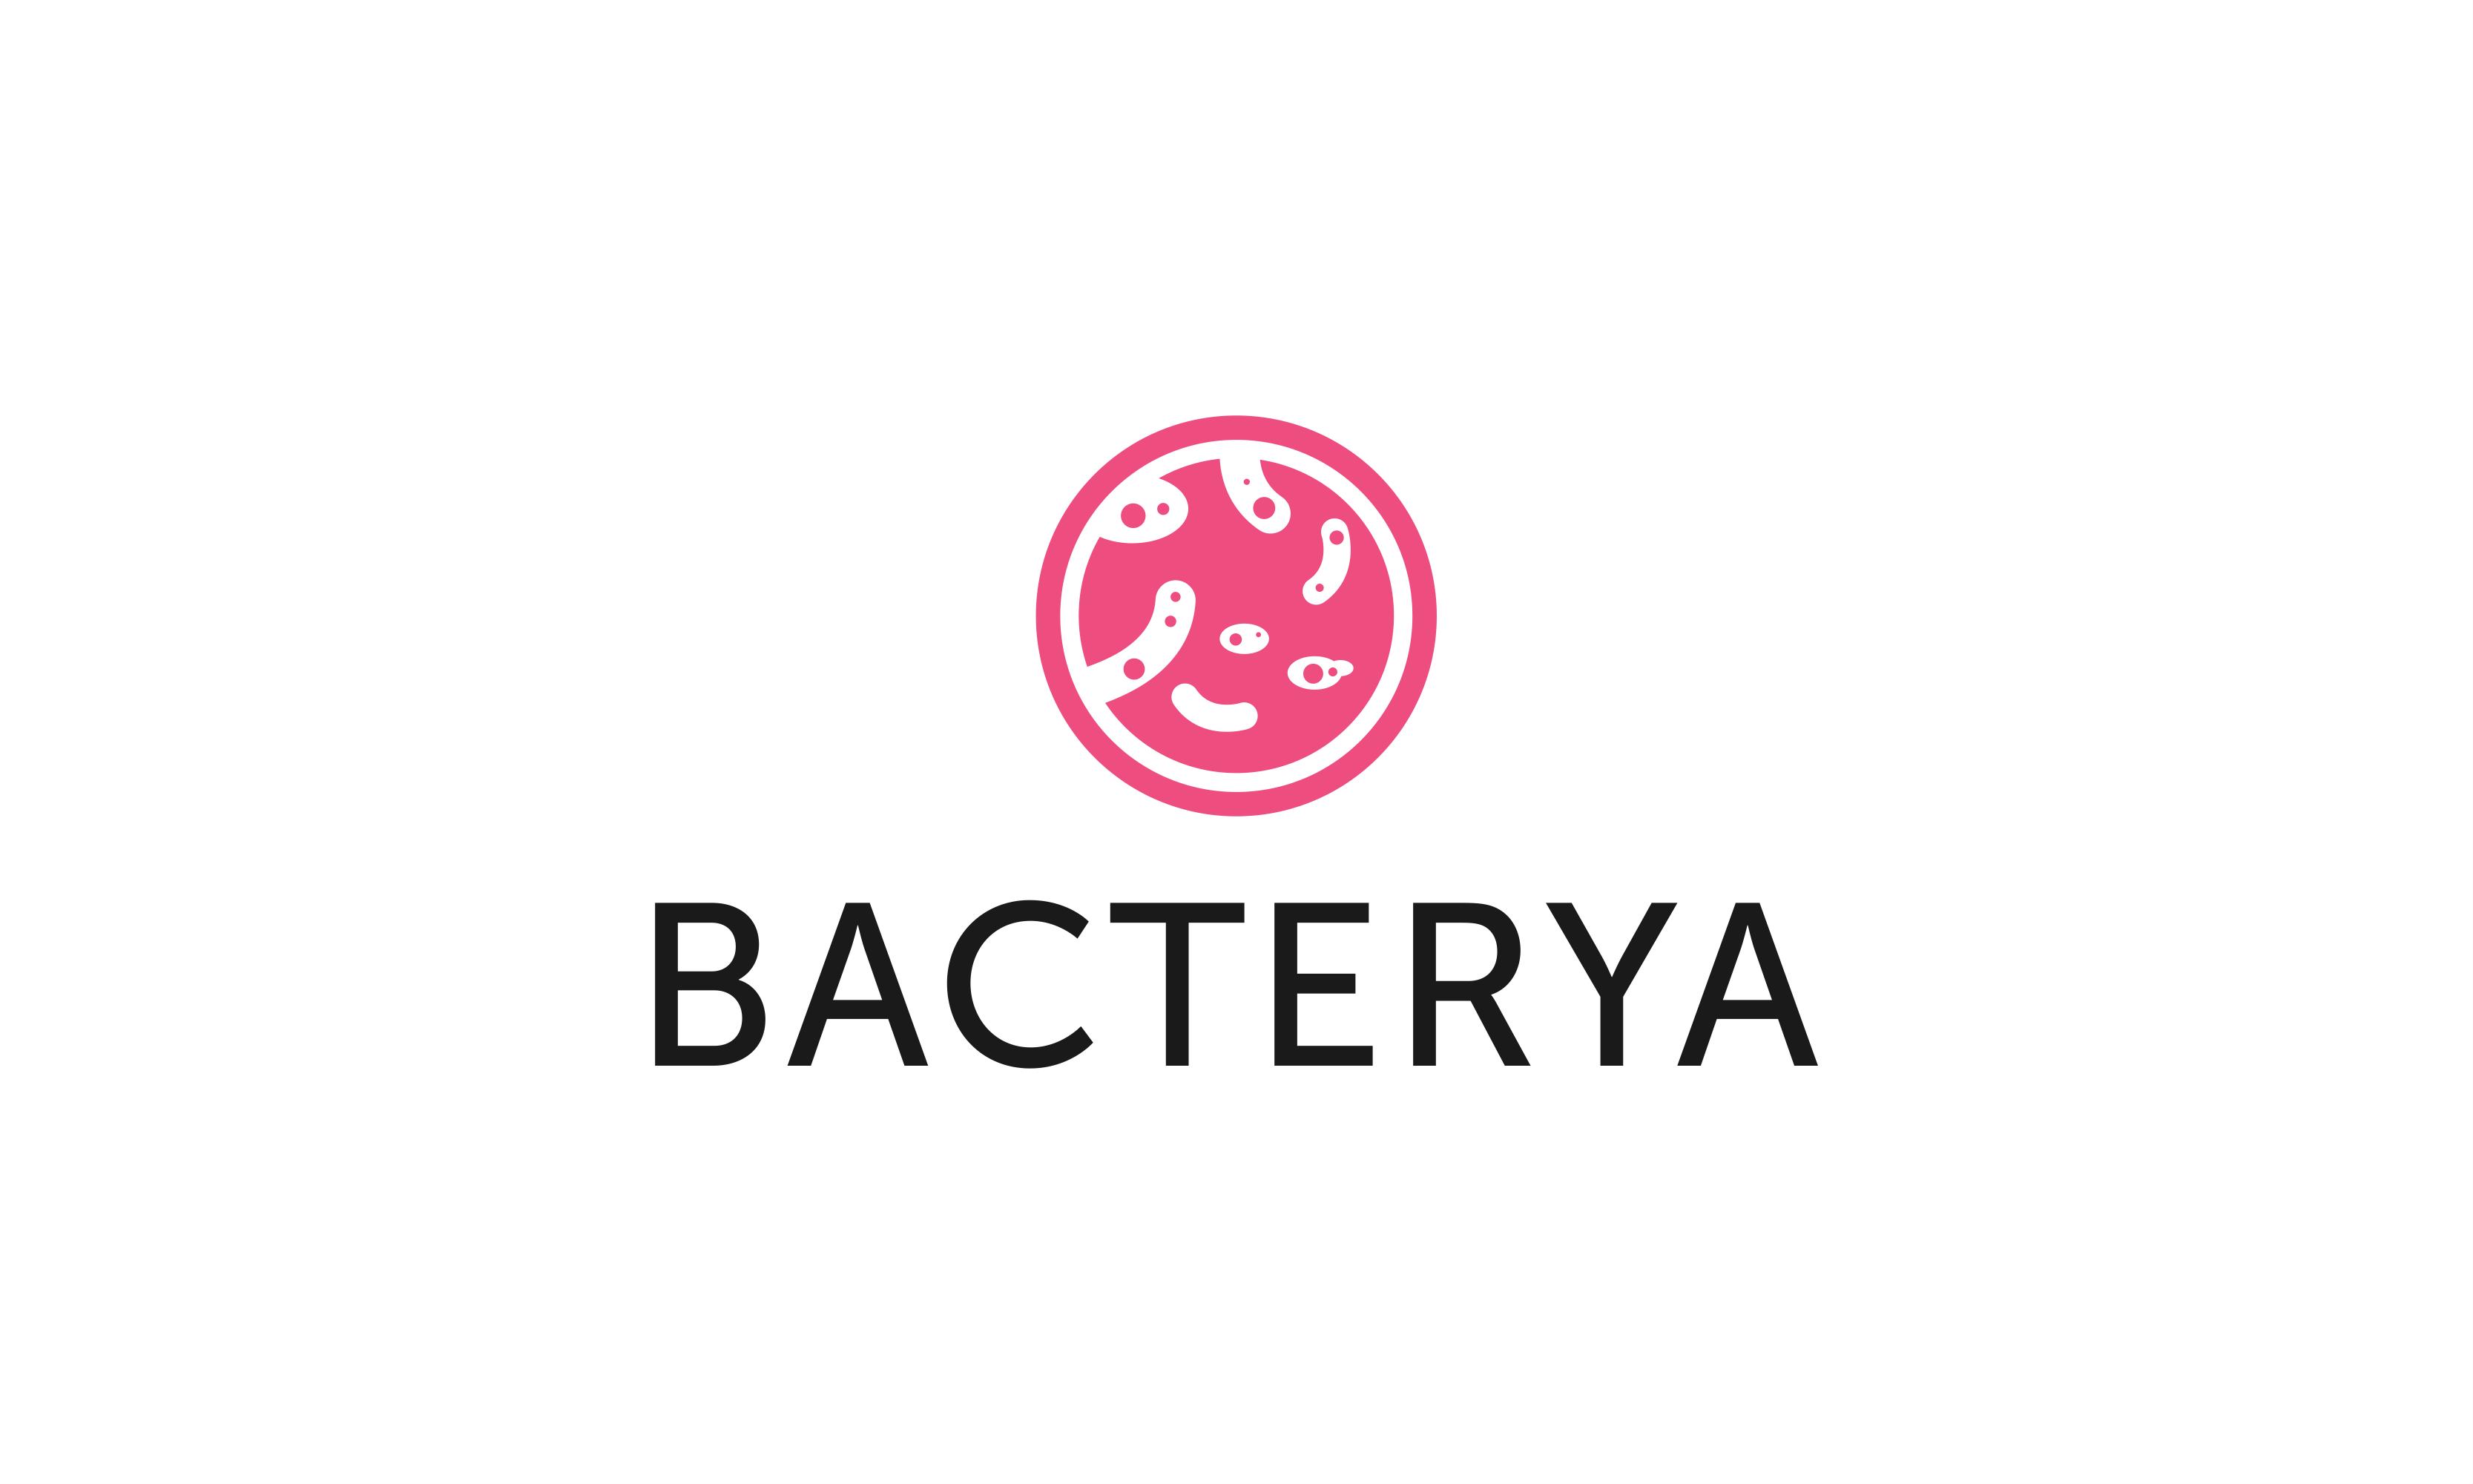 Bacterya